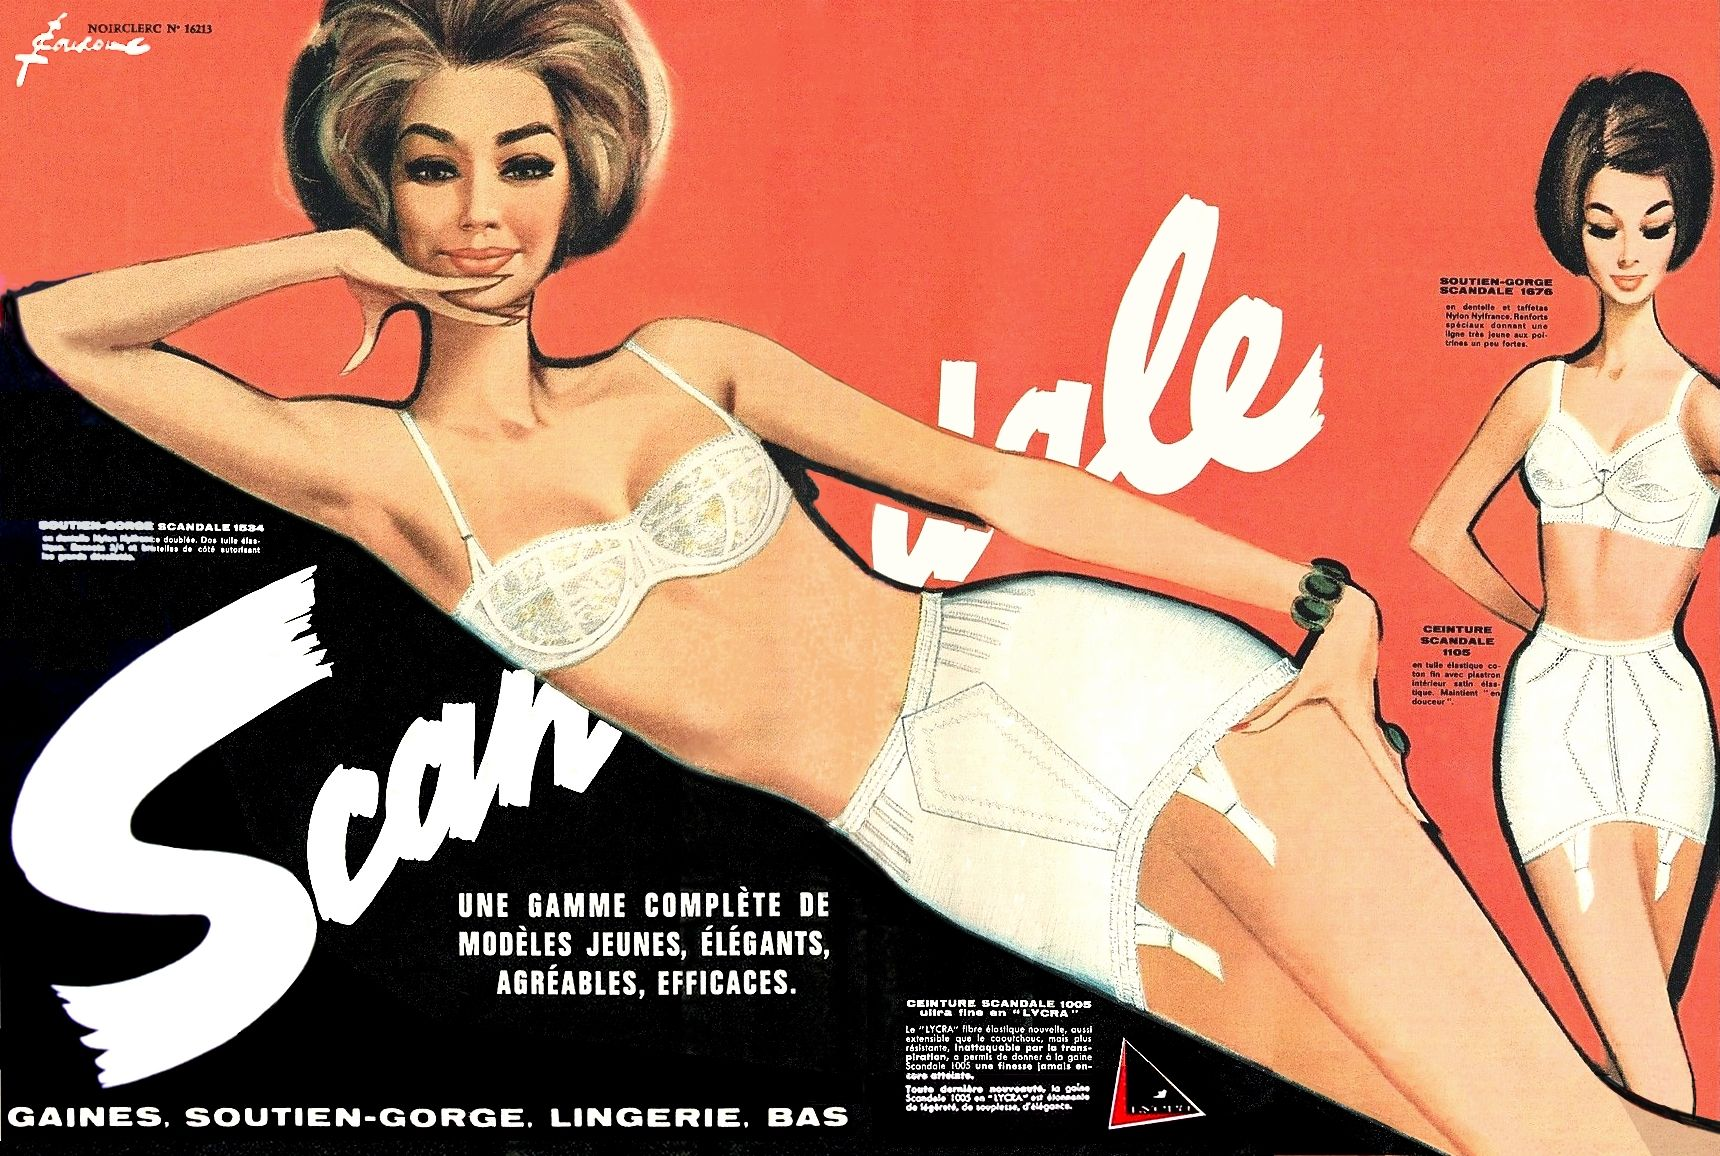 Scandale 1962 Pierre Couronne B1